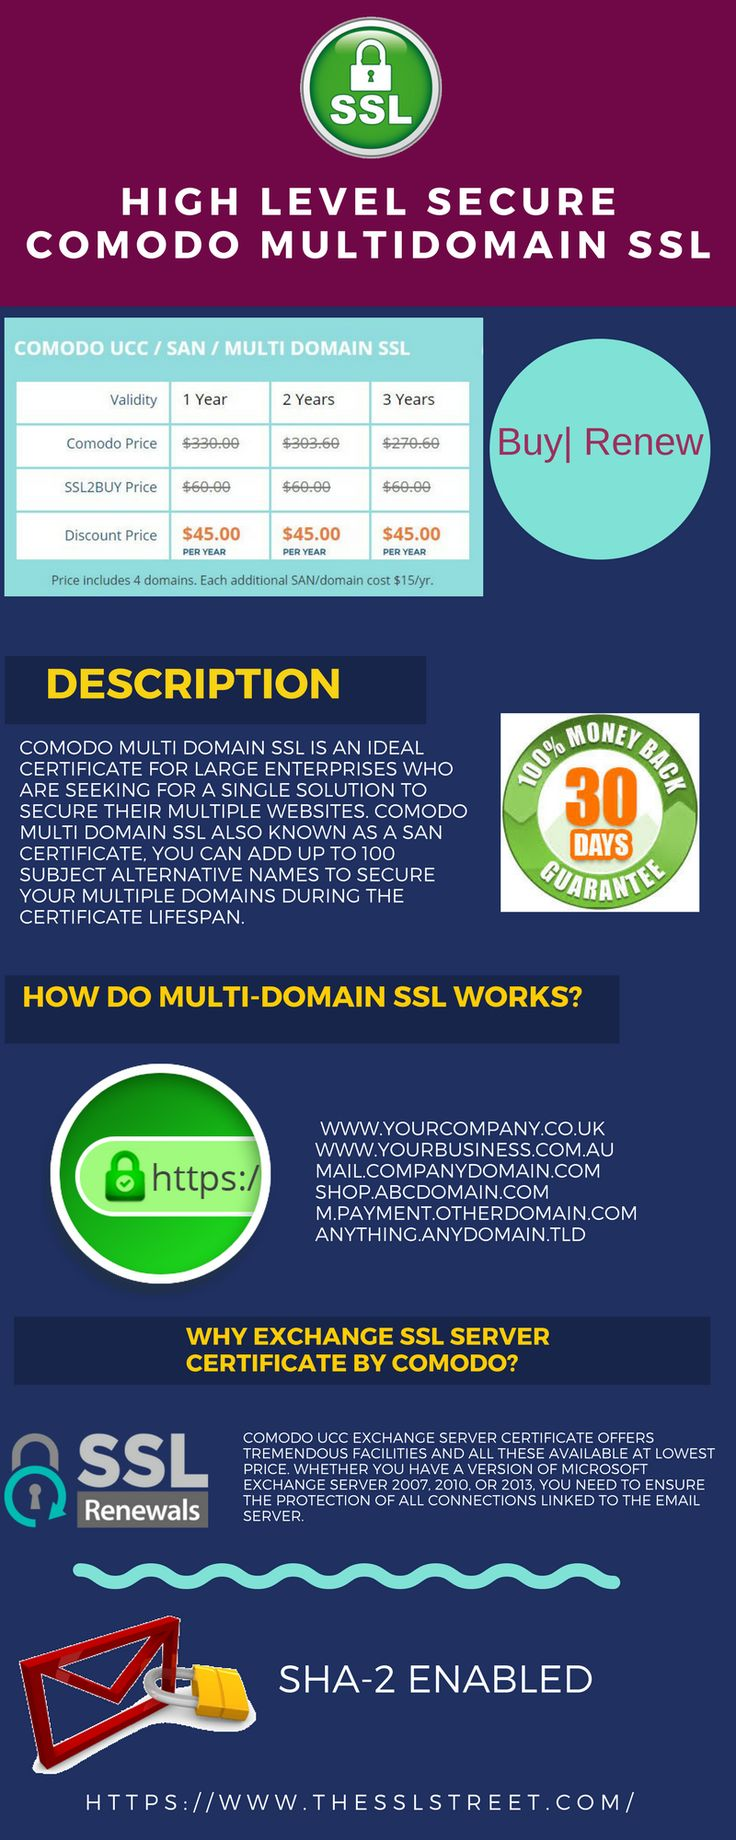 High Level Sercure Comodo UCC/ SAN/ MULTI DOMAIN SSL